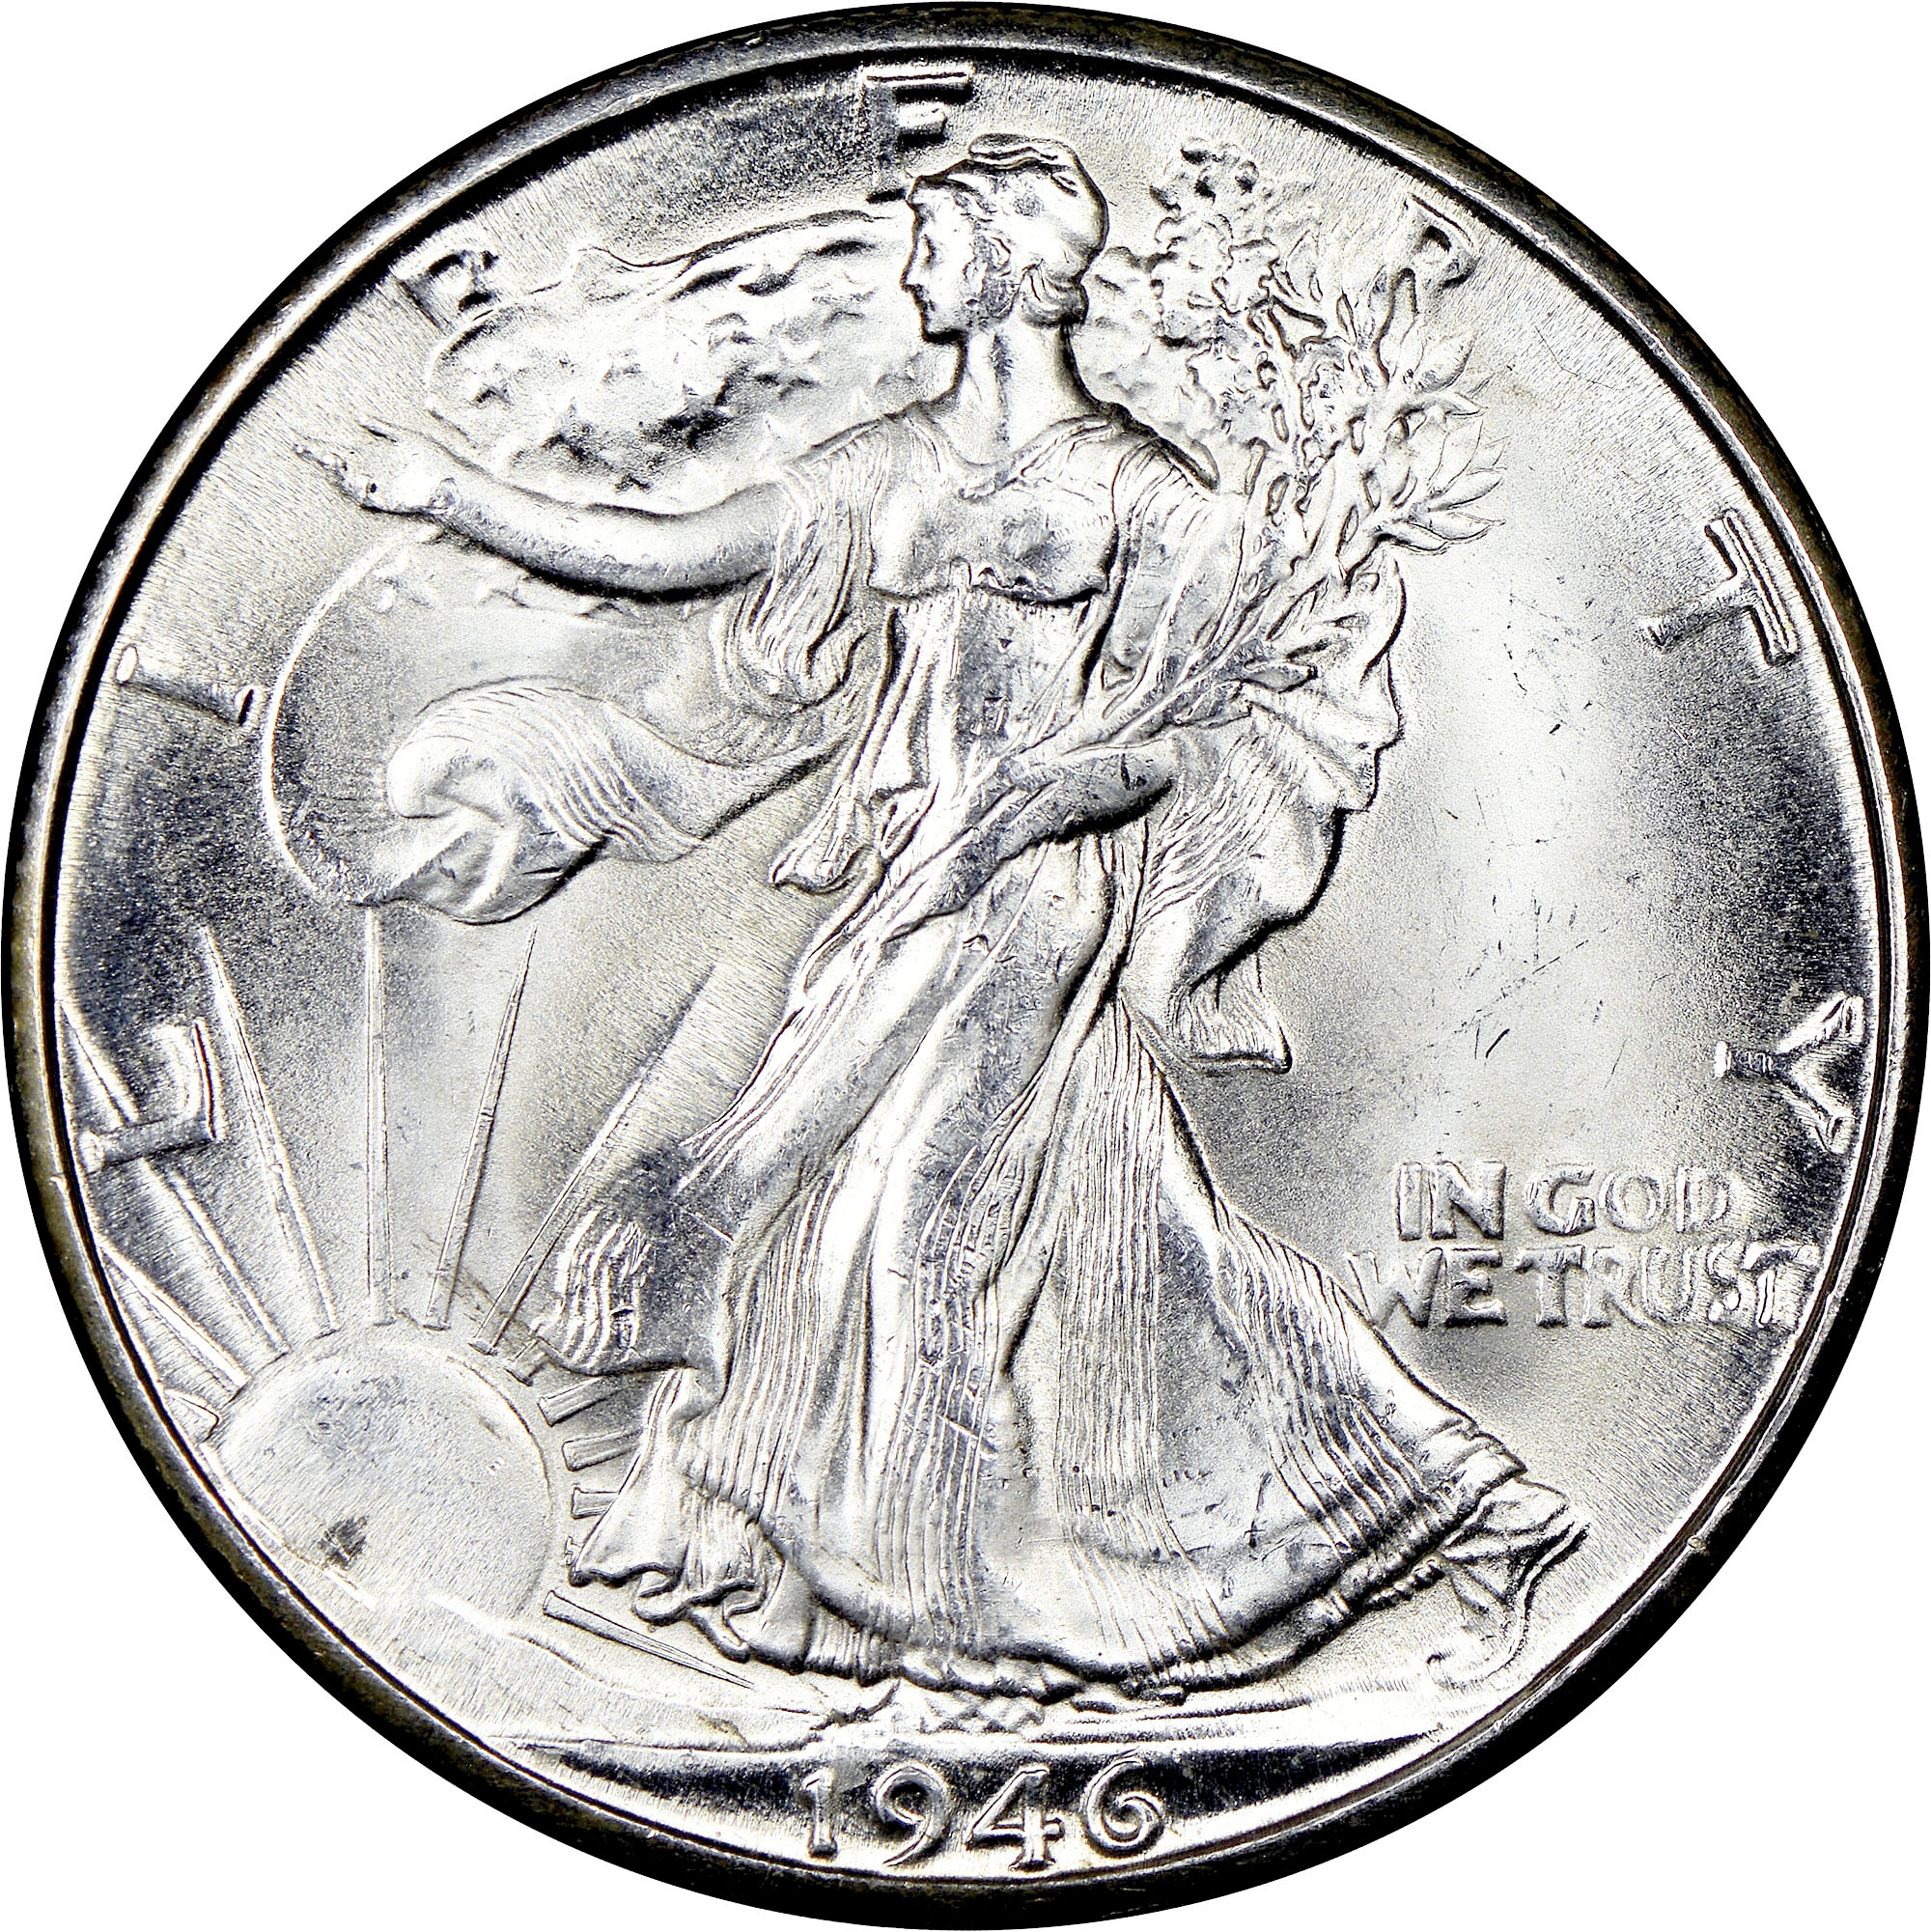 1946 WALKING LIBERTY SILVER HALF DOLLAR IN FINE CONDITION C-19-17